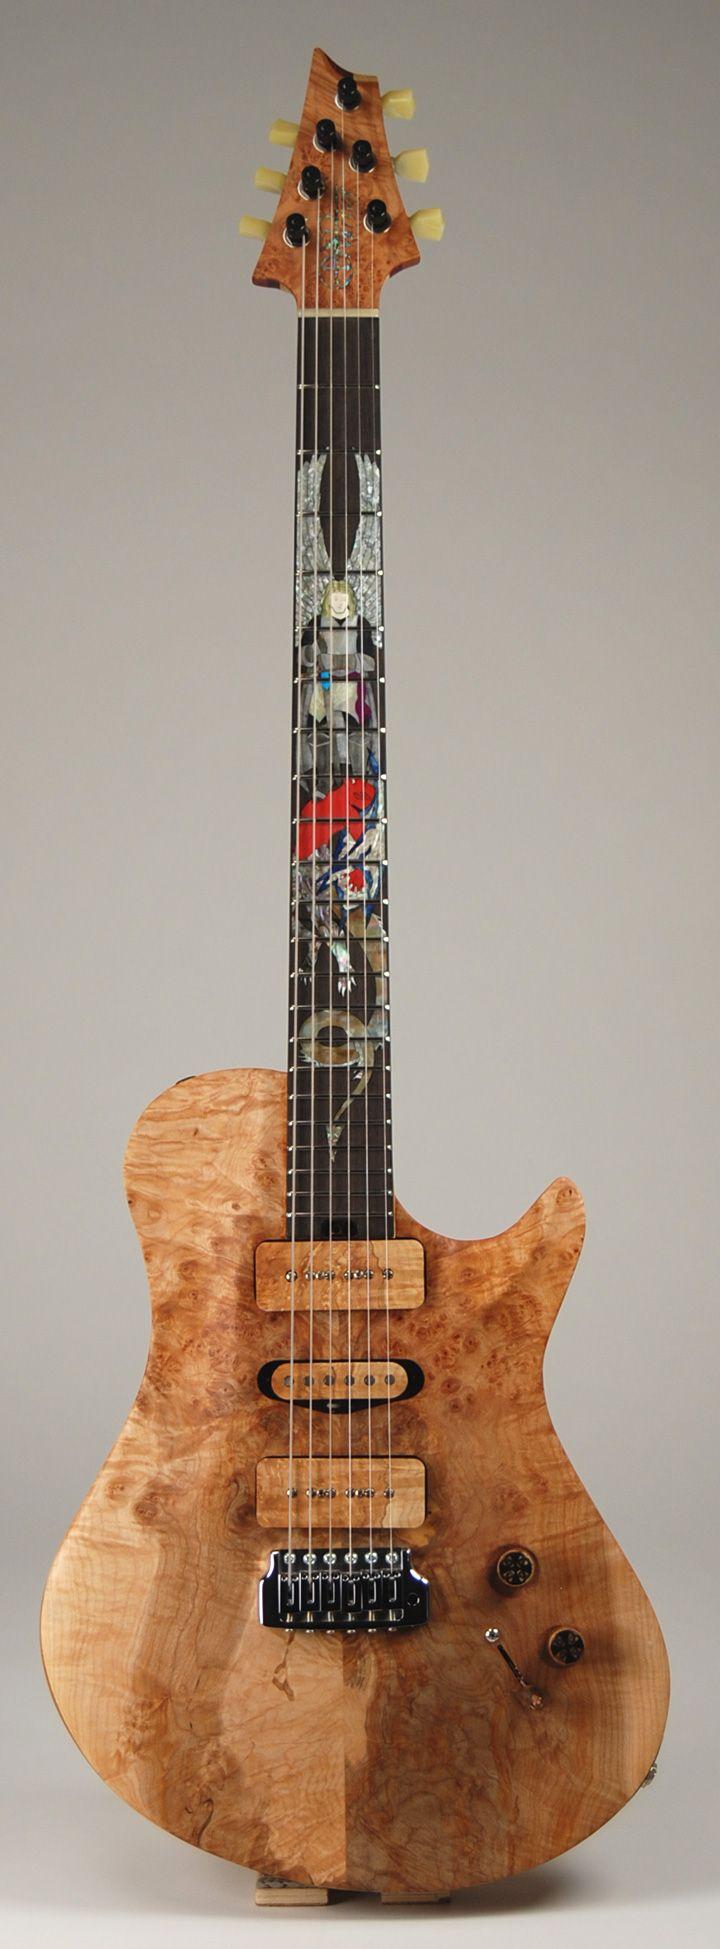 Warrior Custom Shop Rick Derringer Model Guitar Solid Body